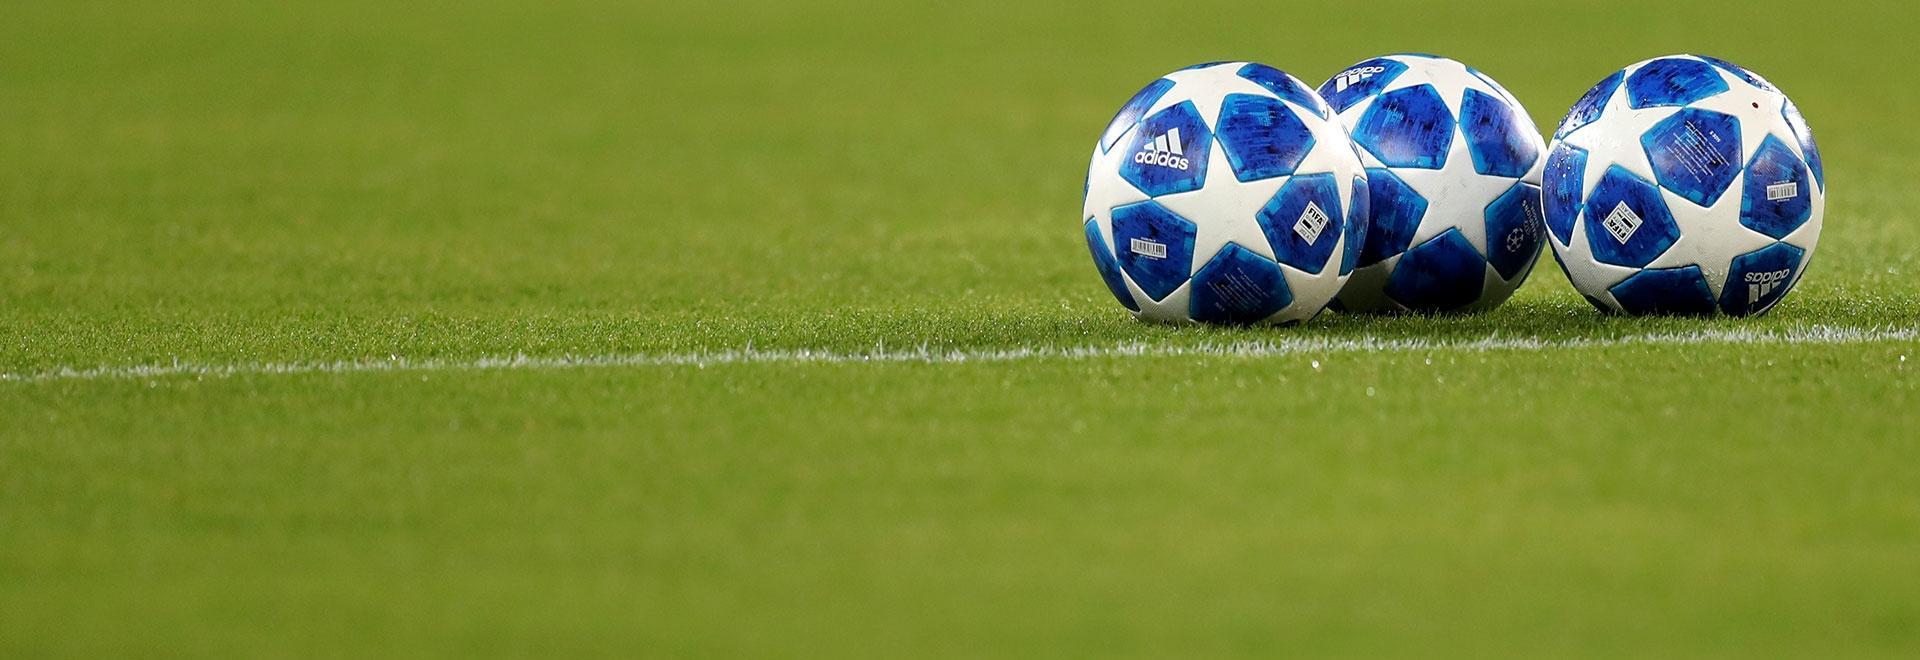 PSV - Tottenham 24/10/18